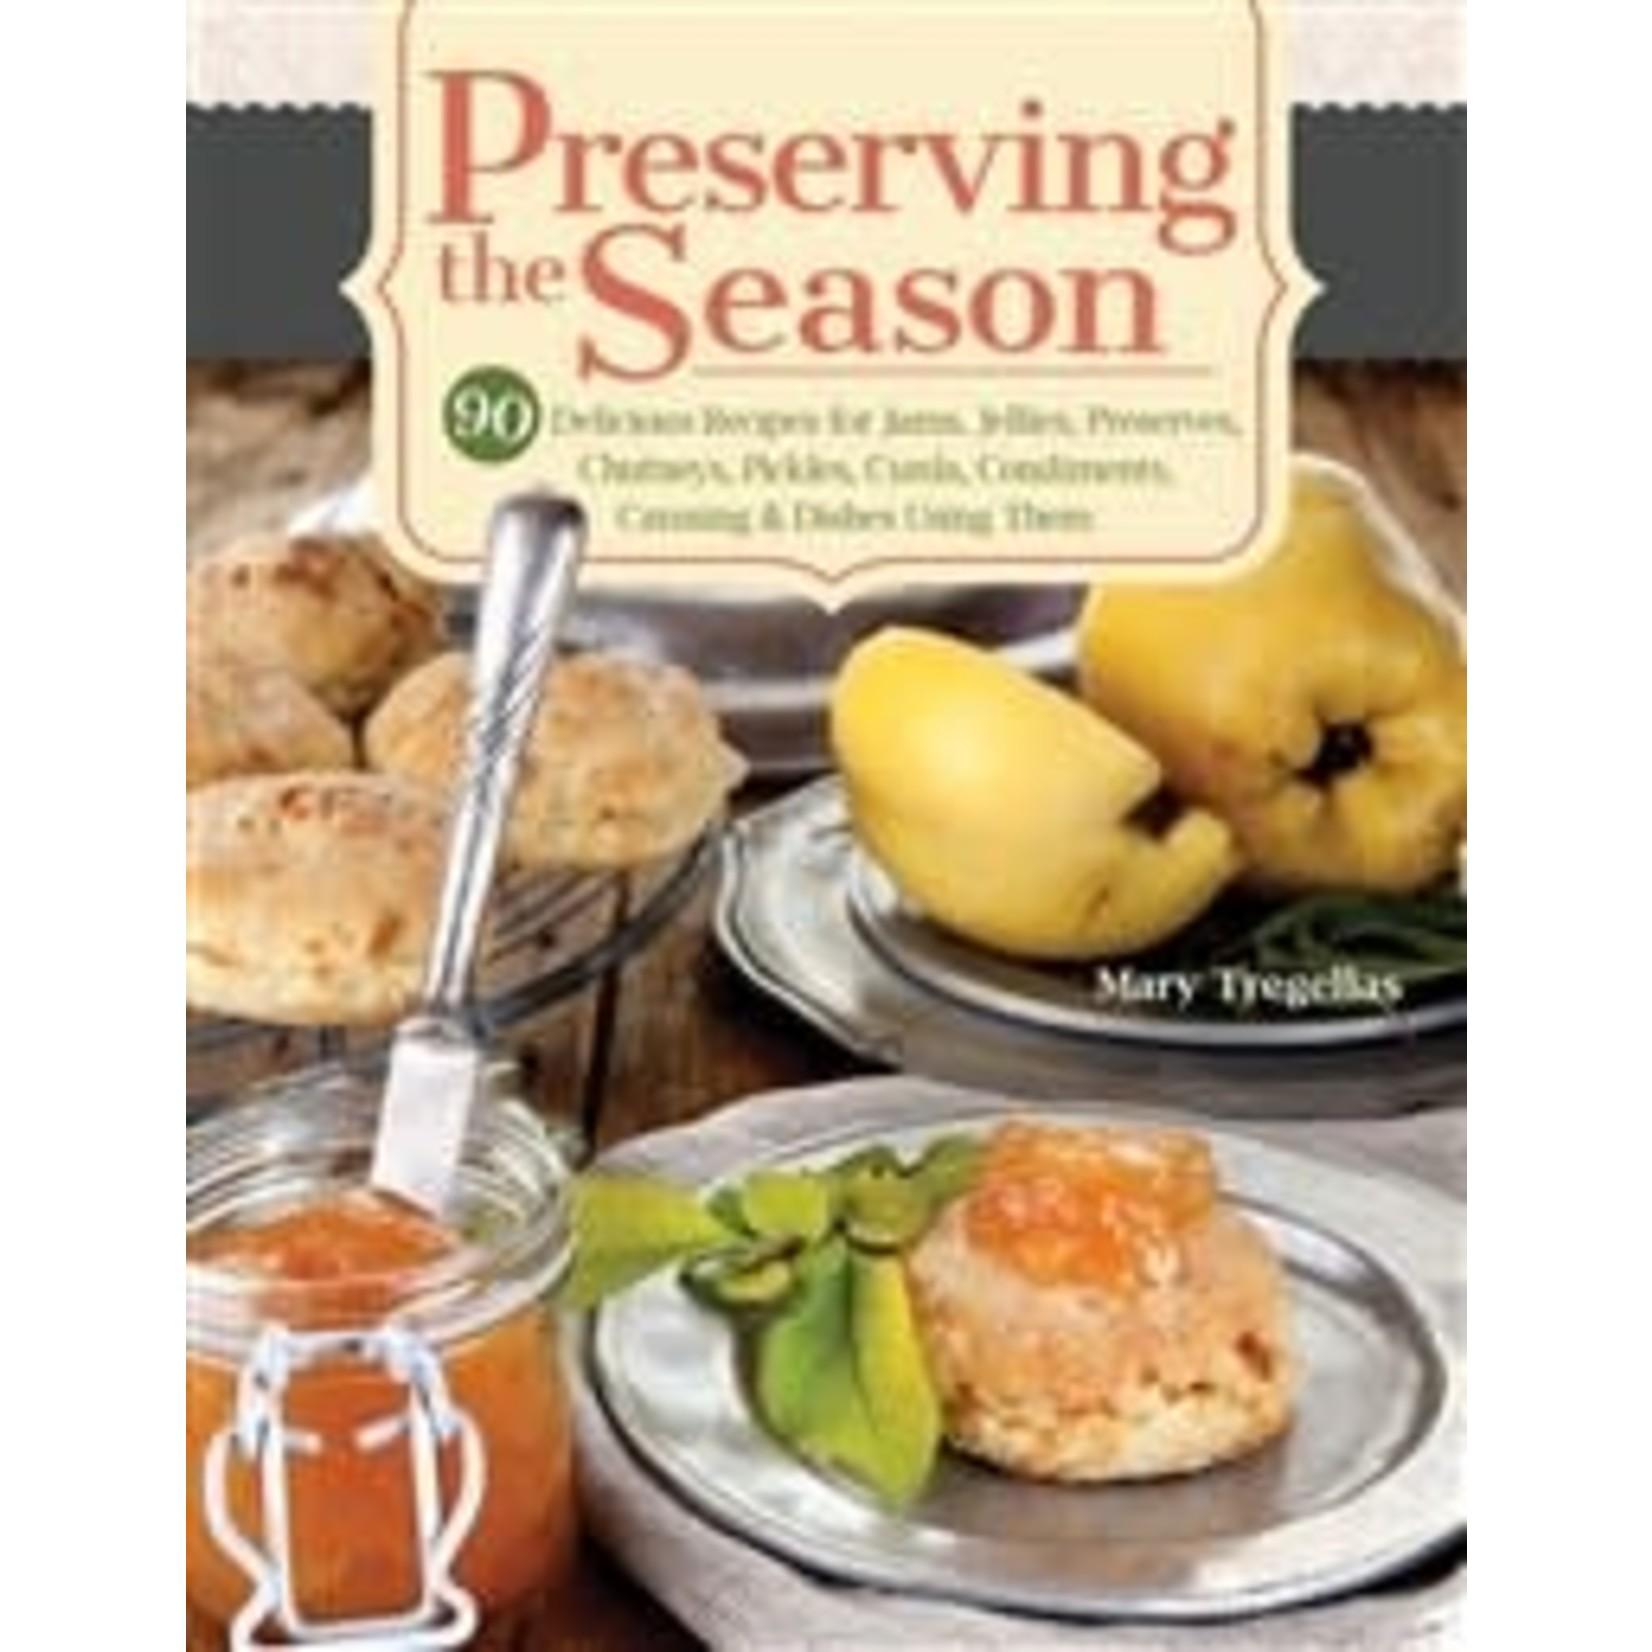 Preserving the Season